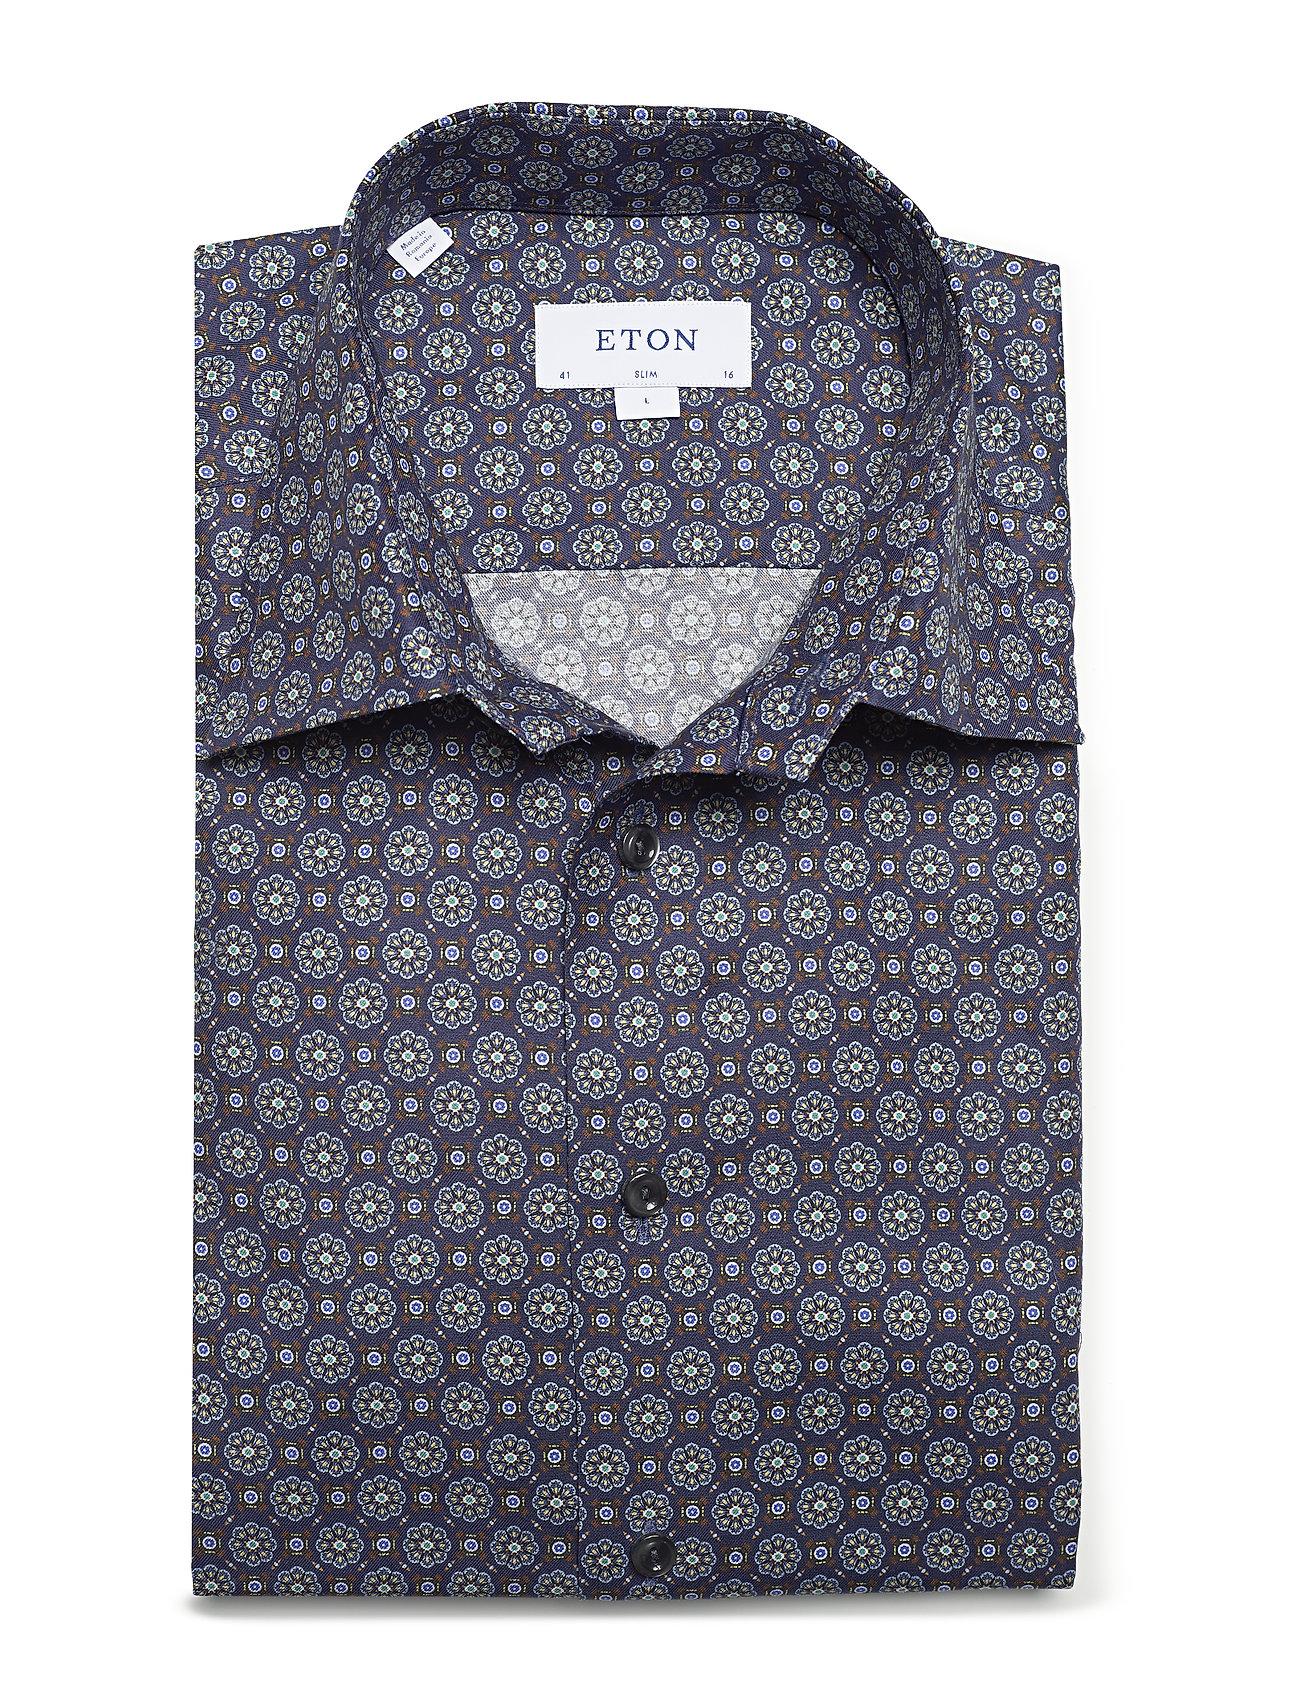 Navy Medallion Print Twill Shirt (Blue) (1019.40 kr) - Eton